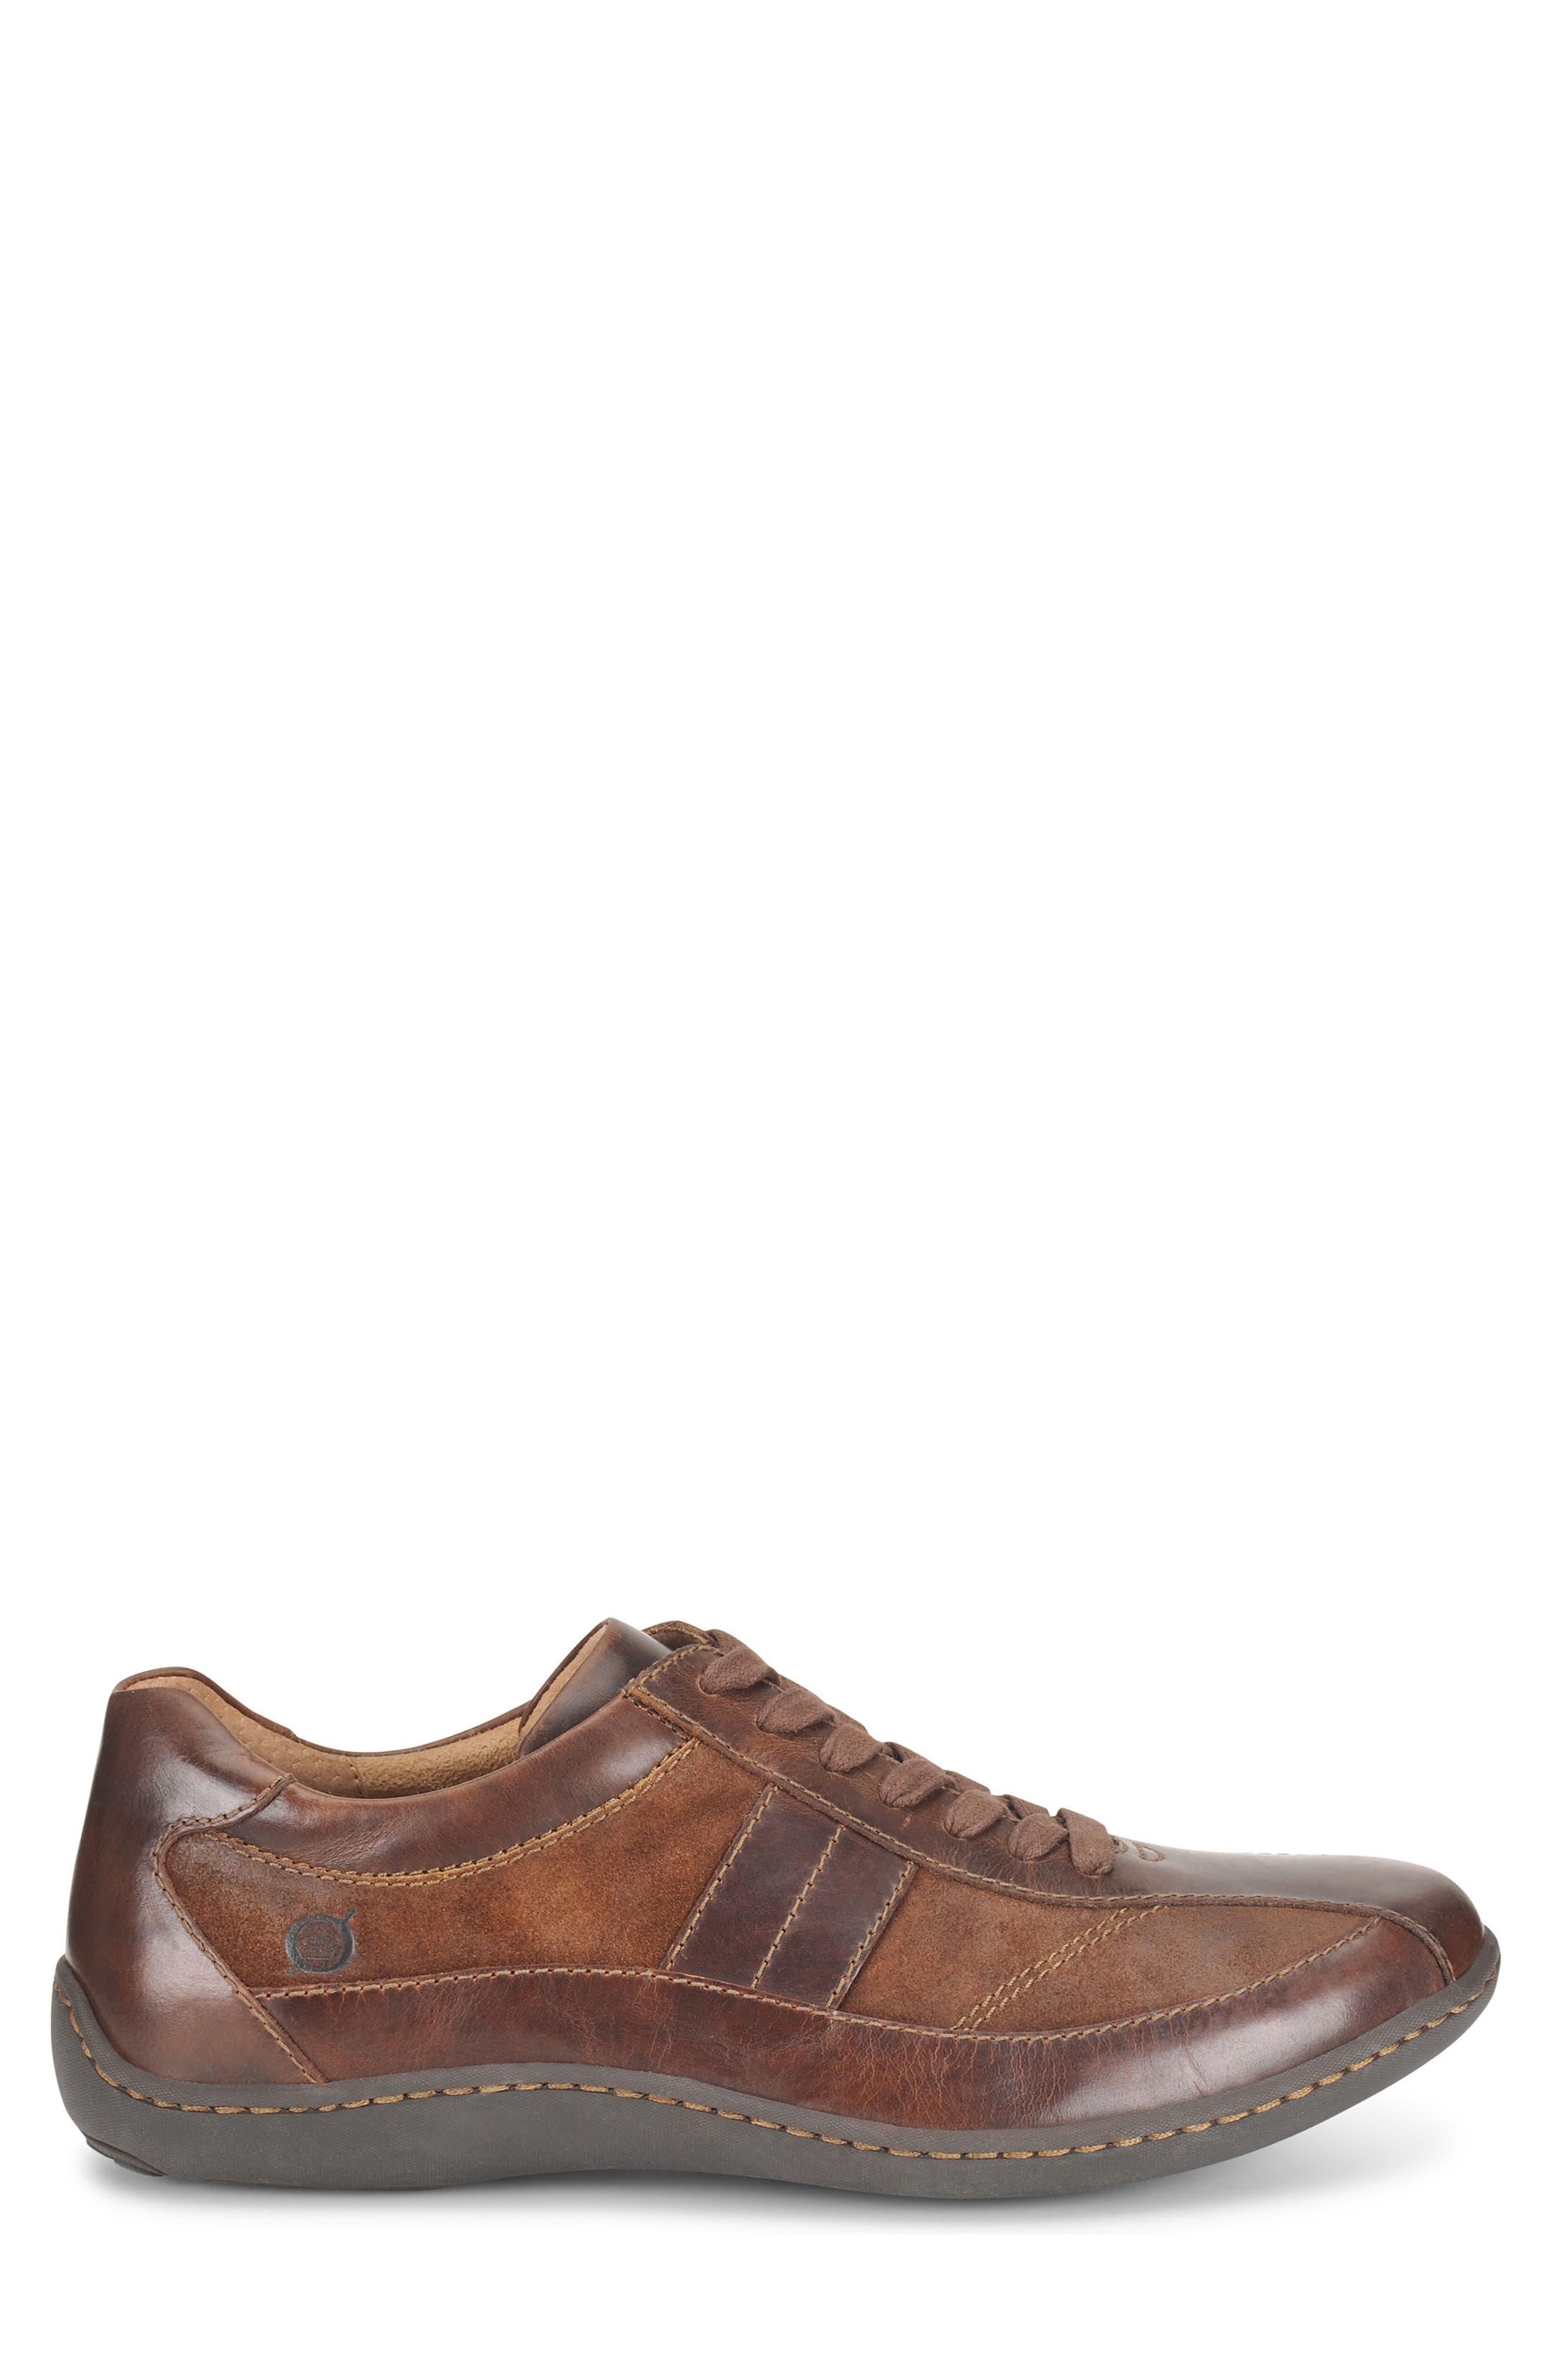 BØRN,                             Breves Low Top Sneaker,                             Alternate thumbnail 3, color,                             230